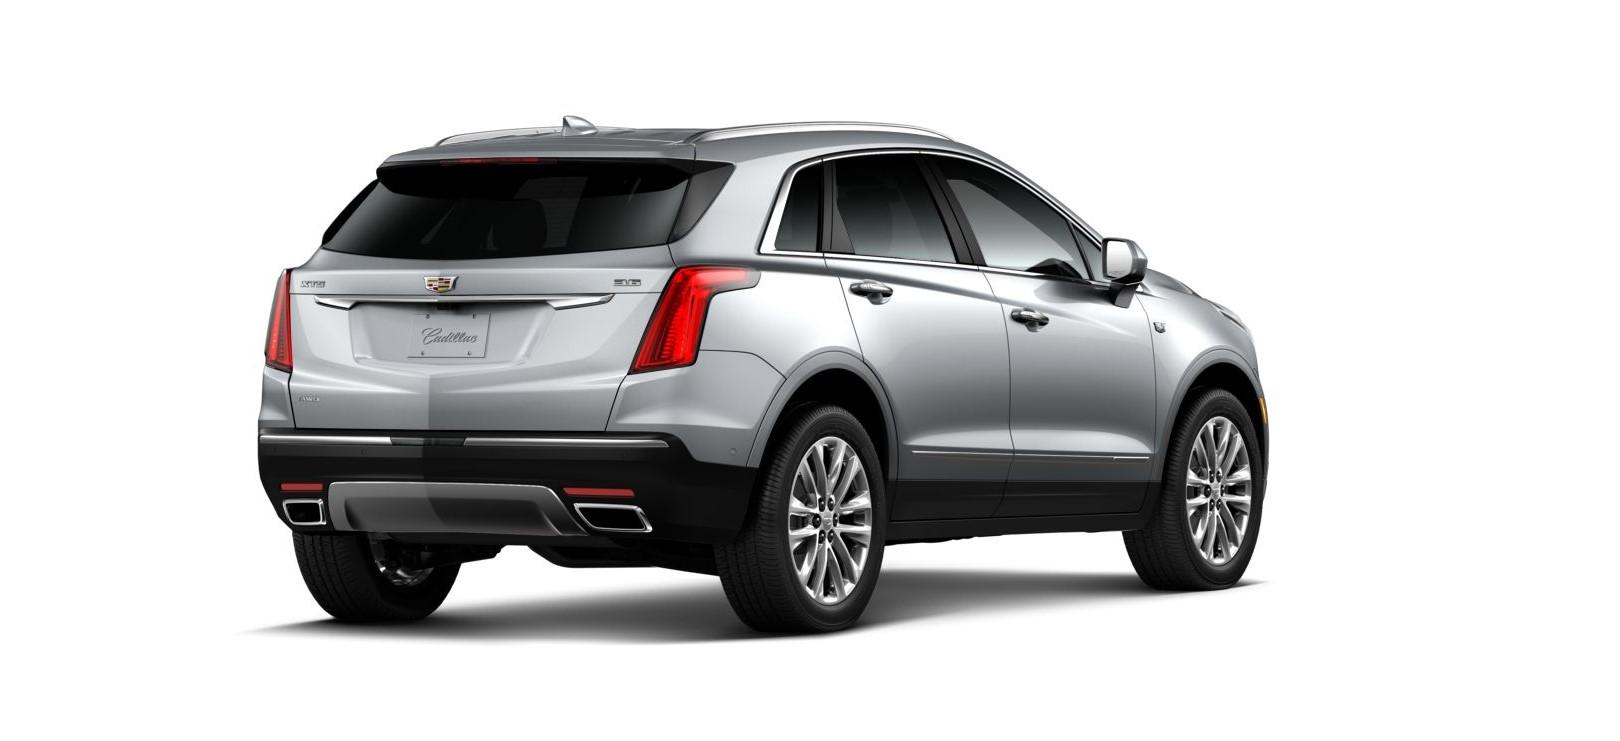 2019 Cadillac XT5 Platinum Rear Silver Exterior